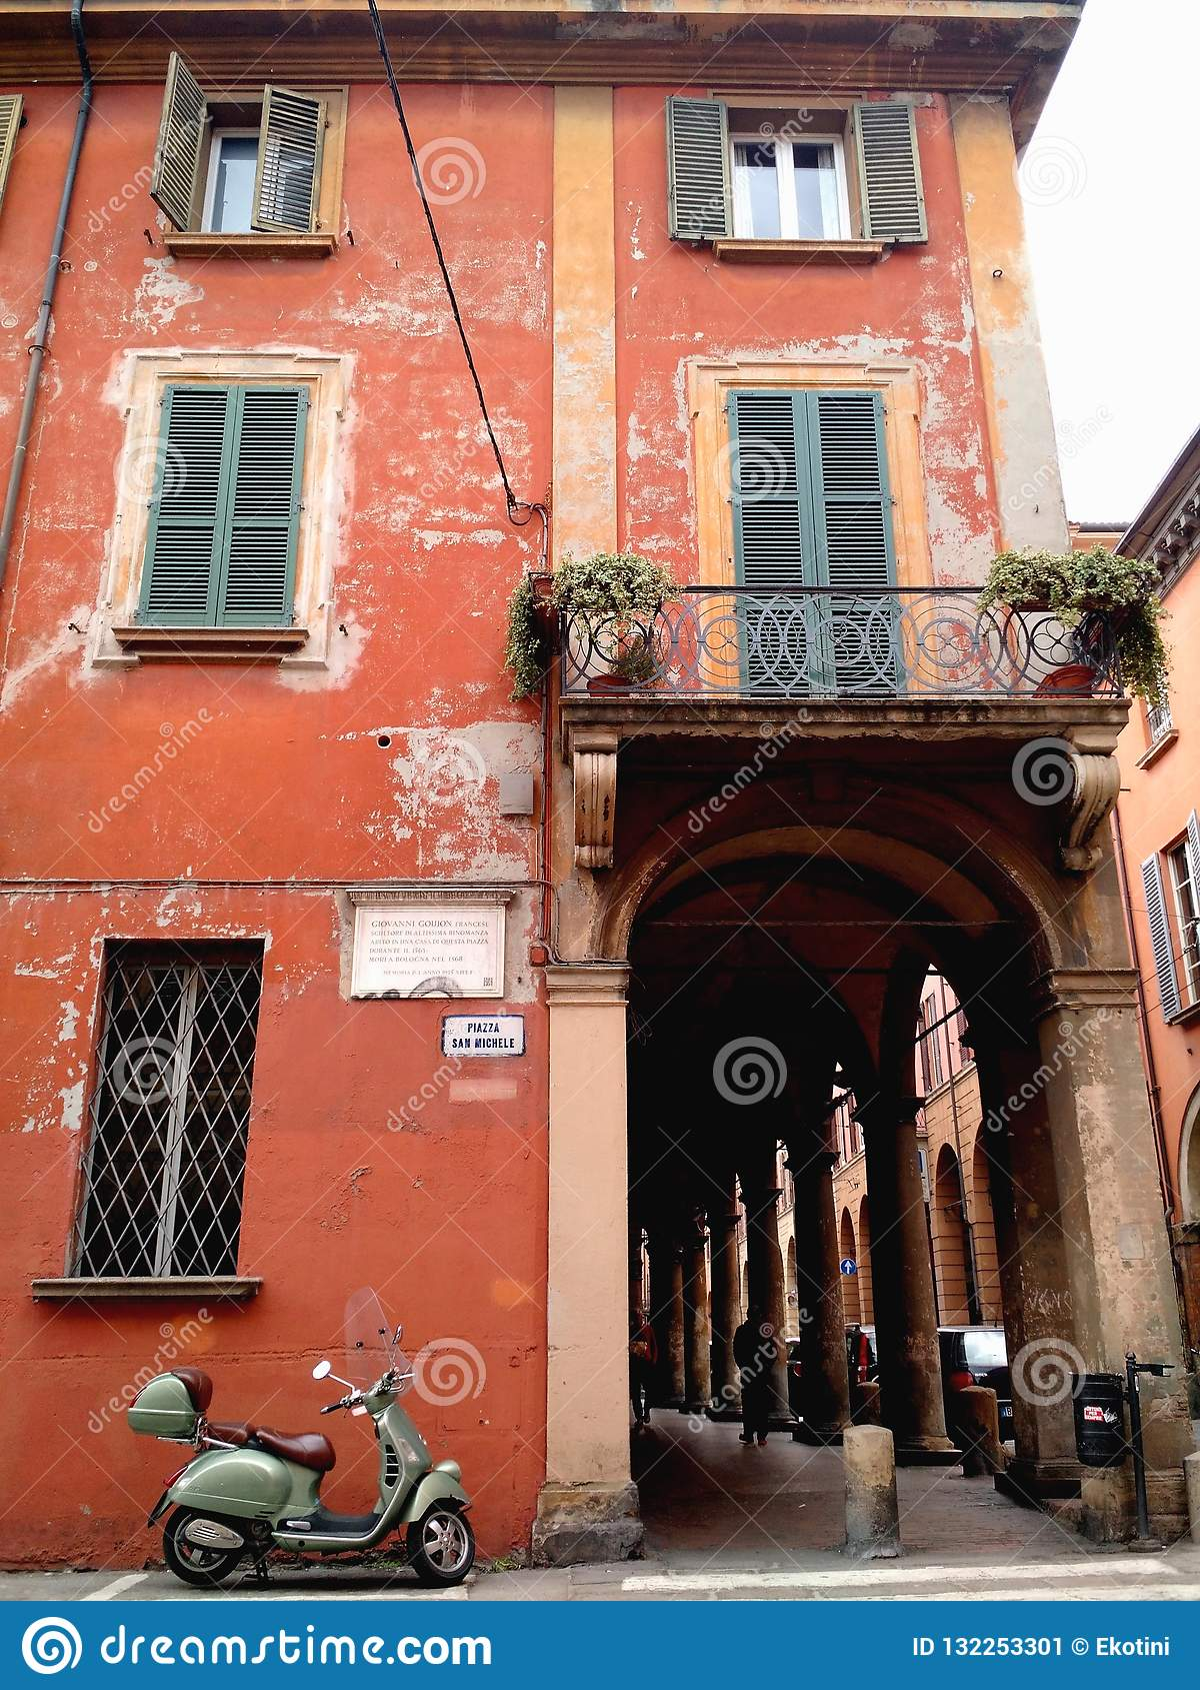 Façade ocre rouge et motocyclette garée, Bologna, Italie